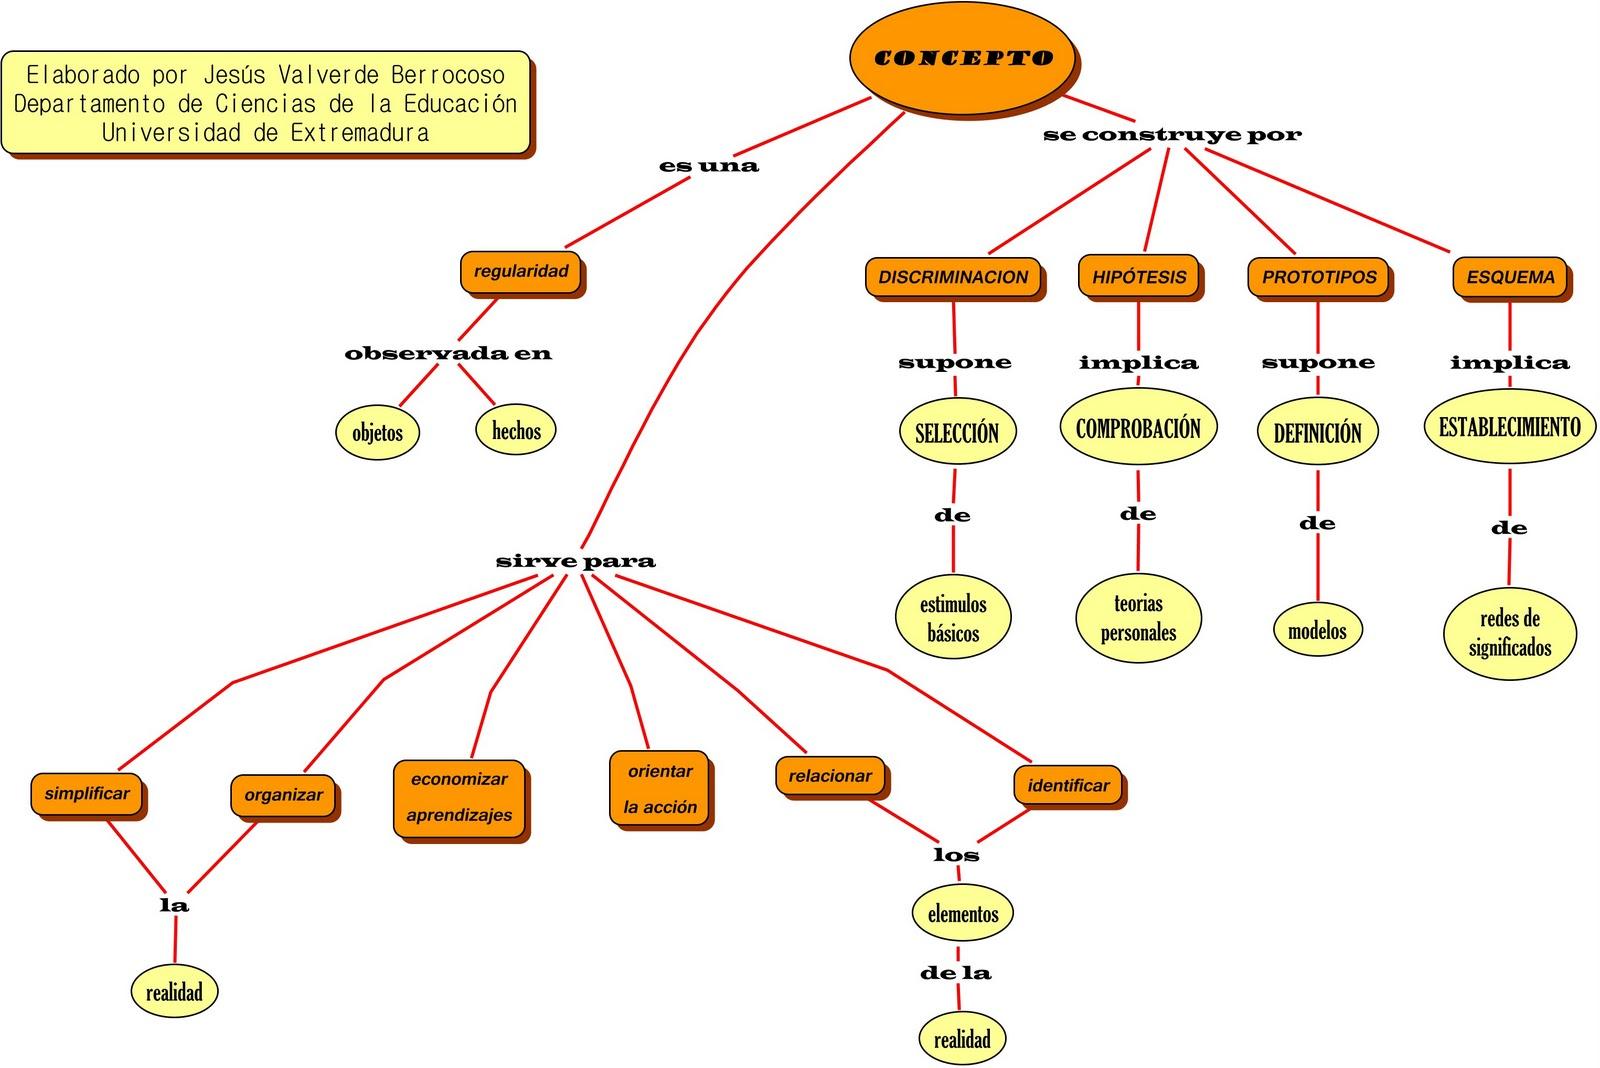 download free traductor de ingles free bittorrentkb